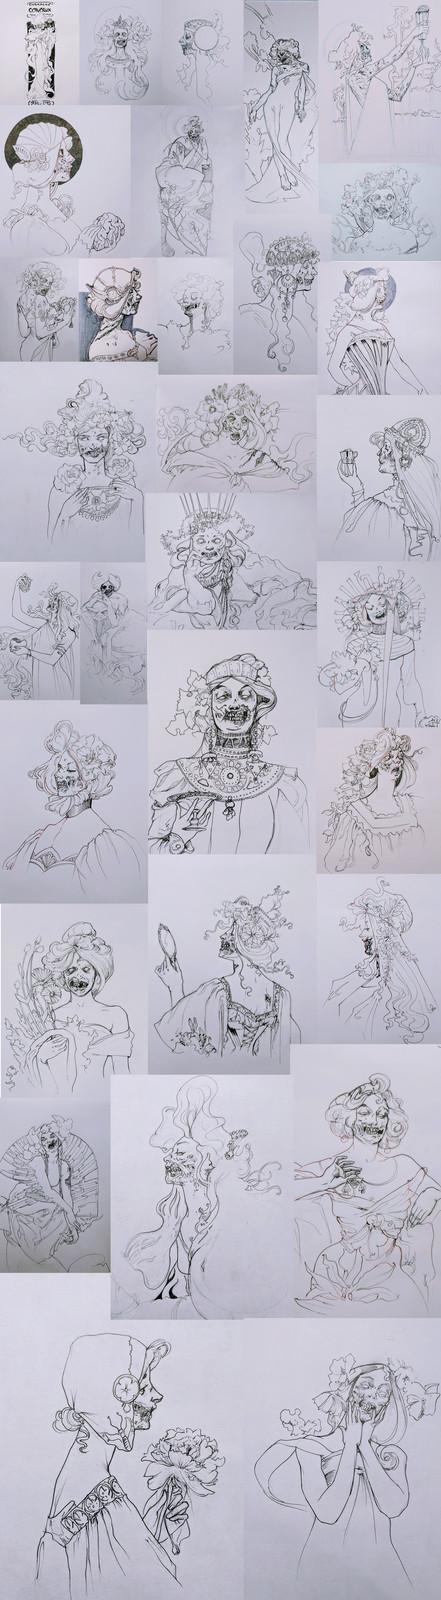 Inktober 2017 - Zombie Nouveau